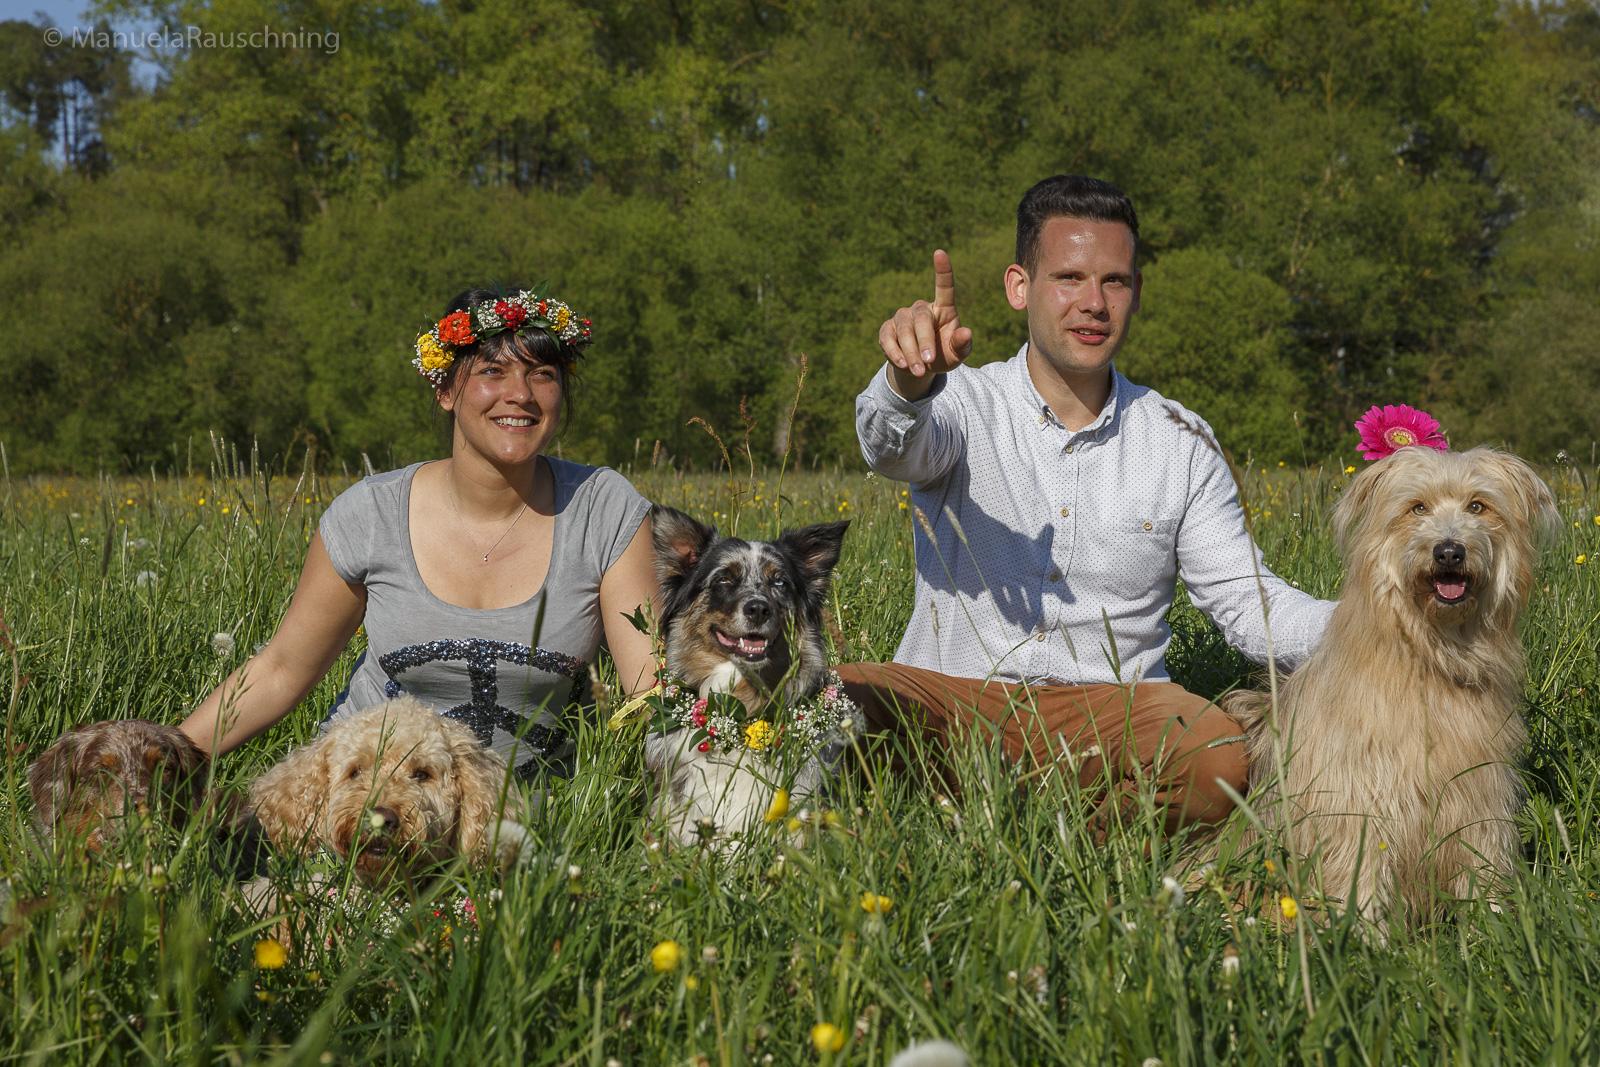 Hundefotografie Bilderrausch